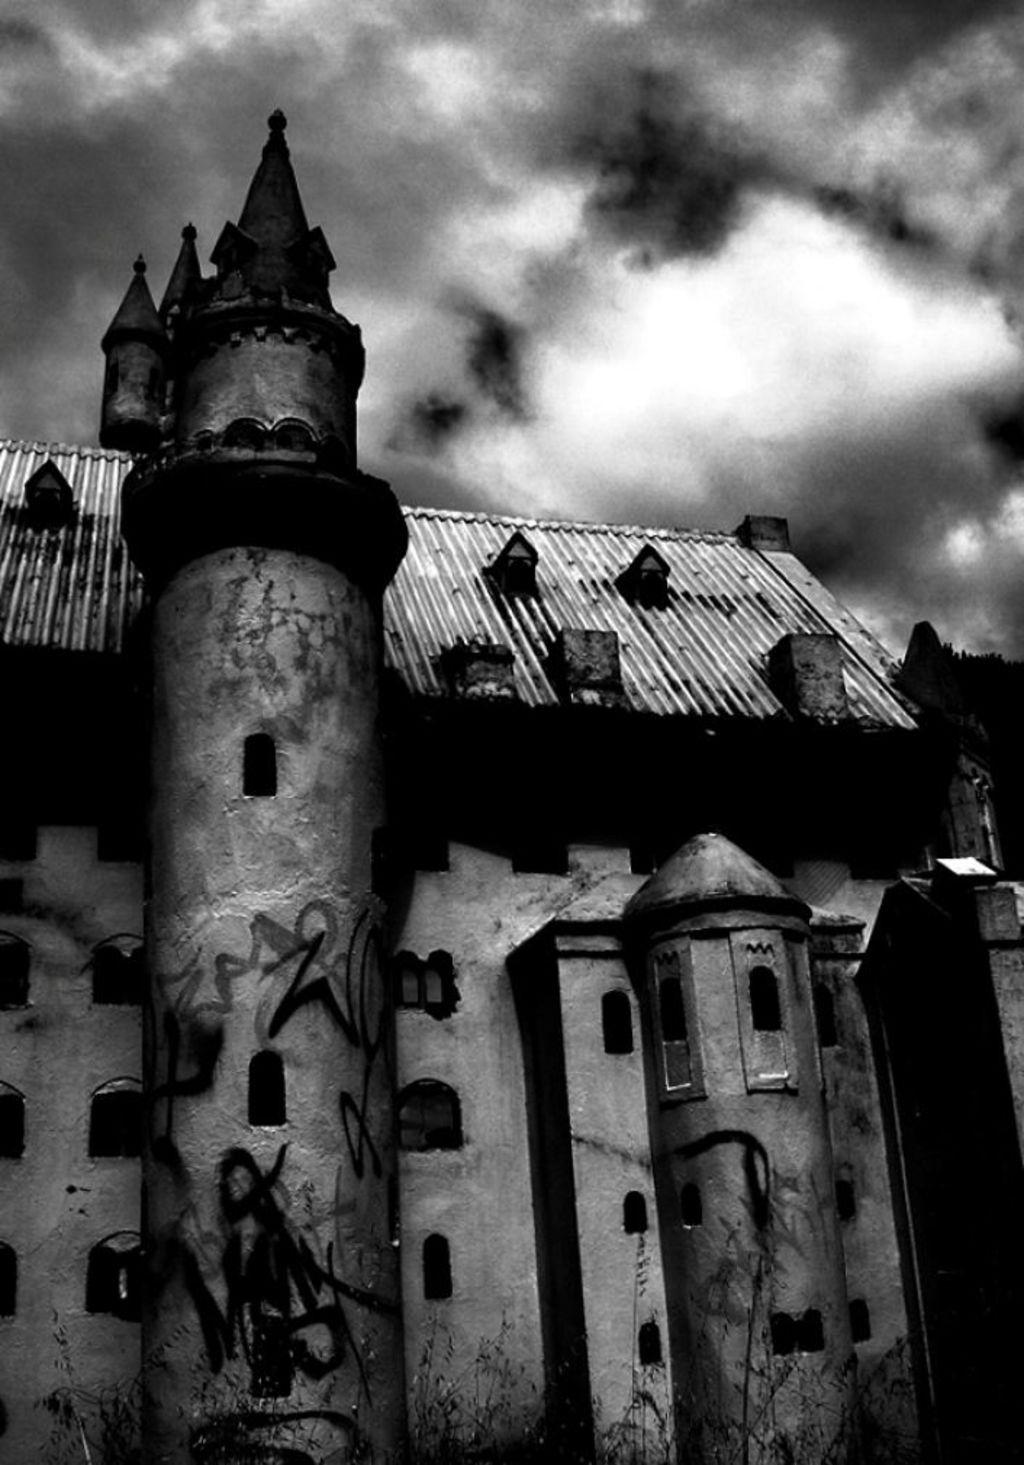 The former Castle Fun Park near Mandurah. All that remains is a derelict minature castle covered in graffiti. Photo: Mandurah Mail